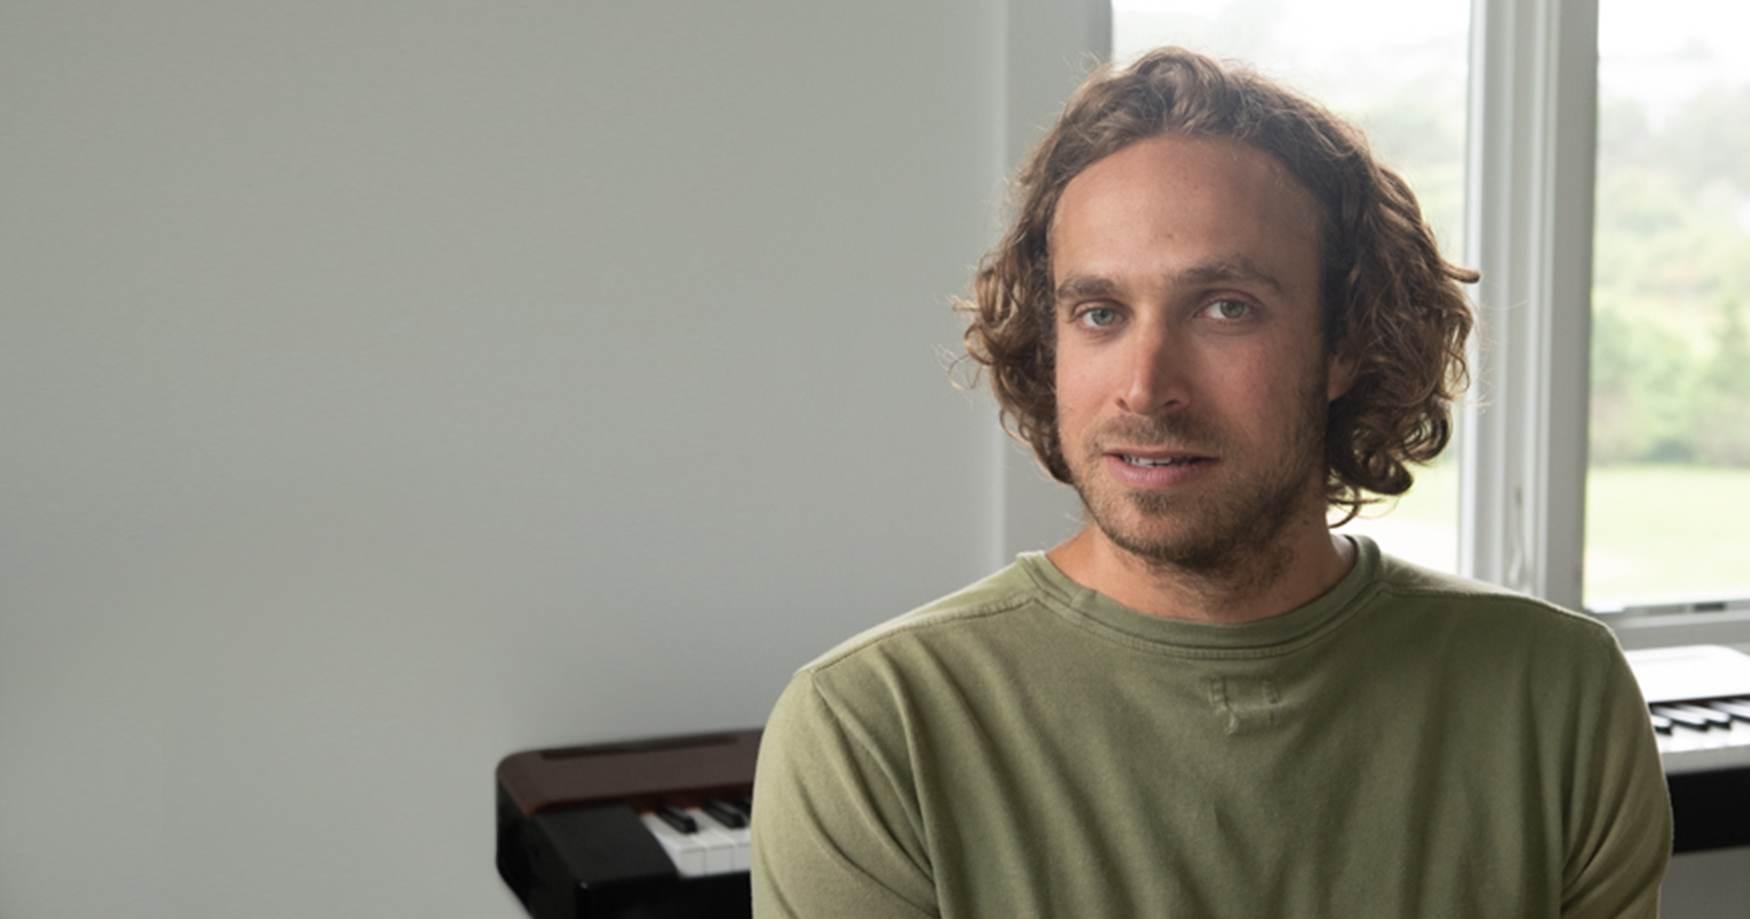 Composer Jackson Greenberg